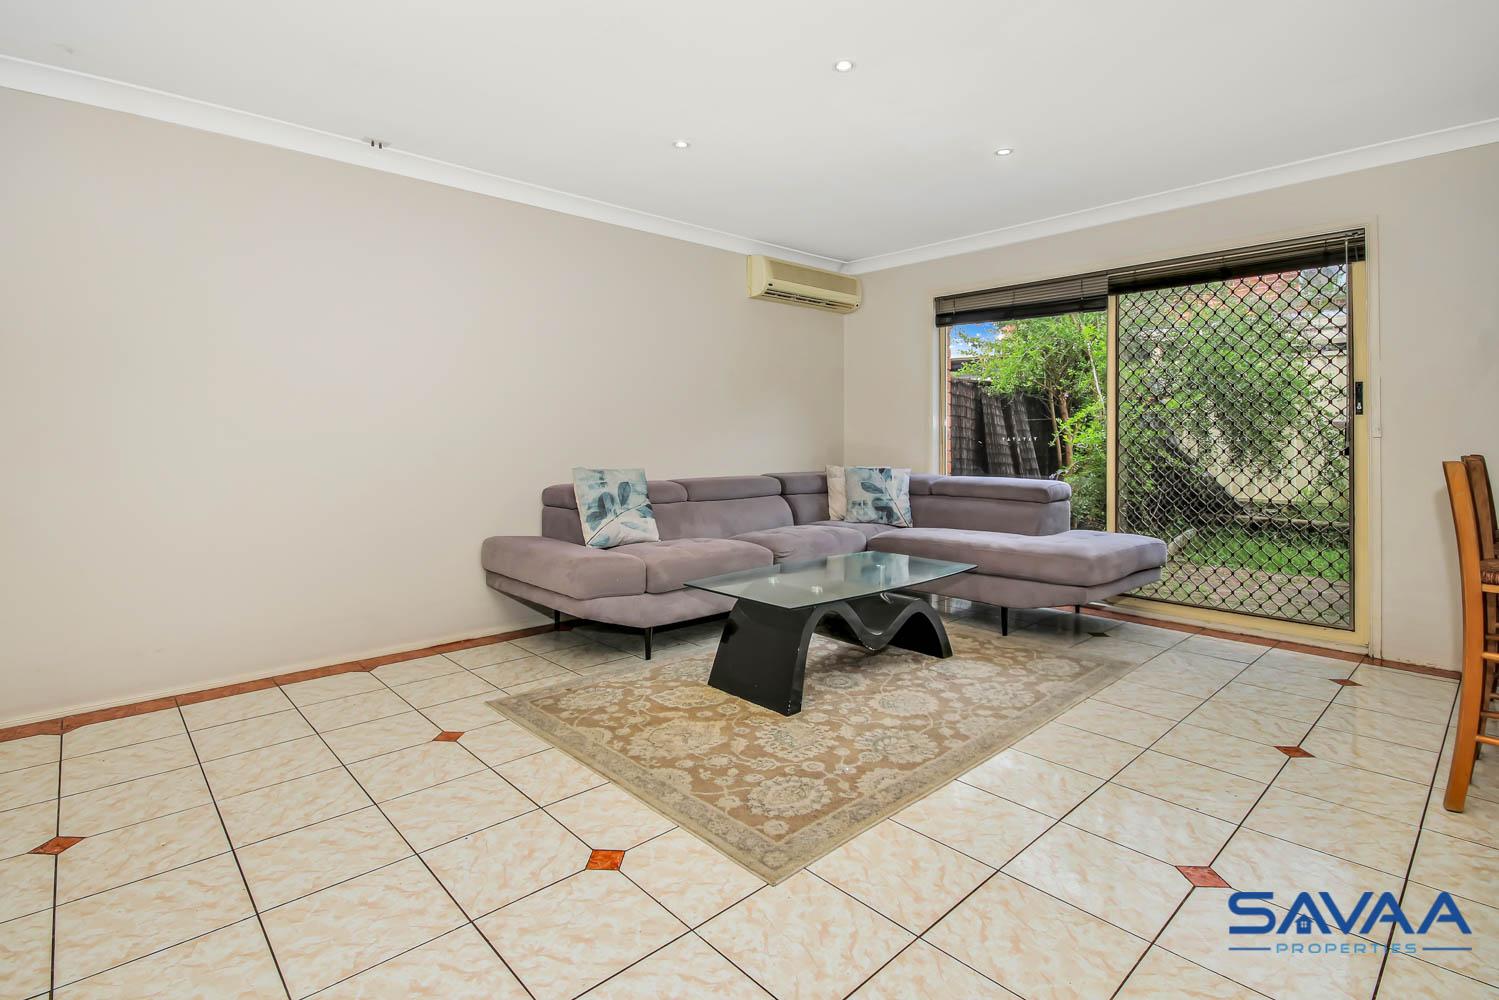 87 130 RESERVOIR ROAD, Blacktown NSW